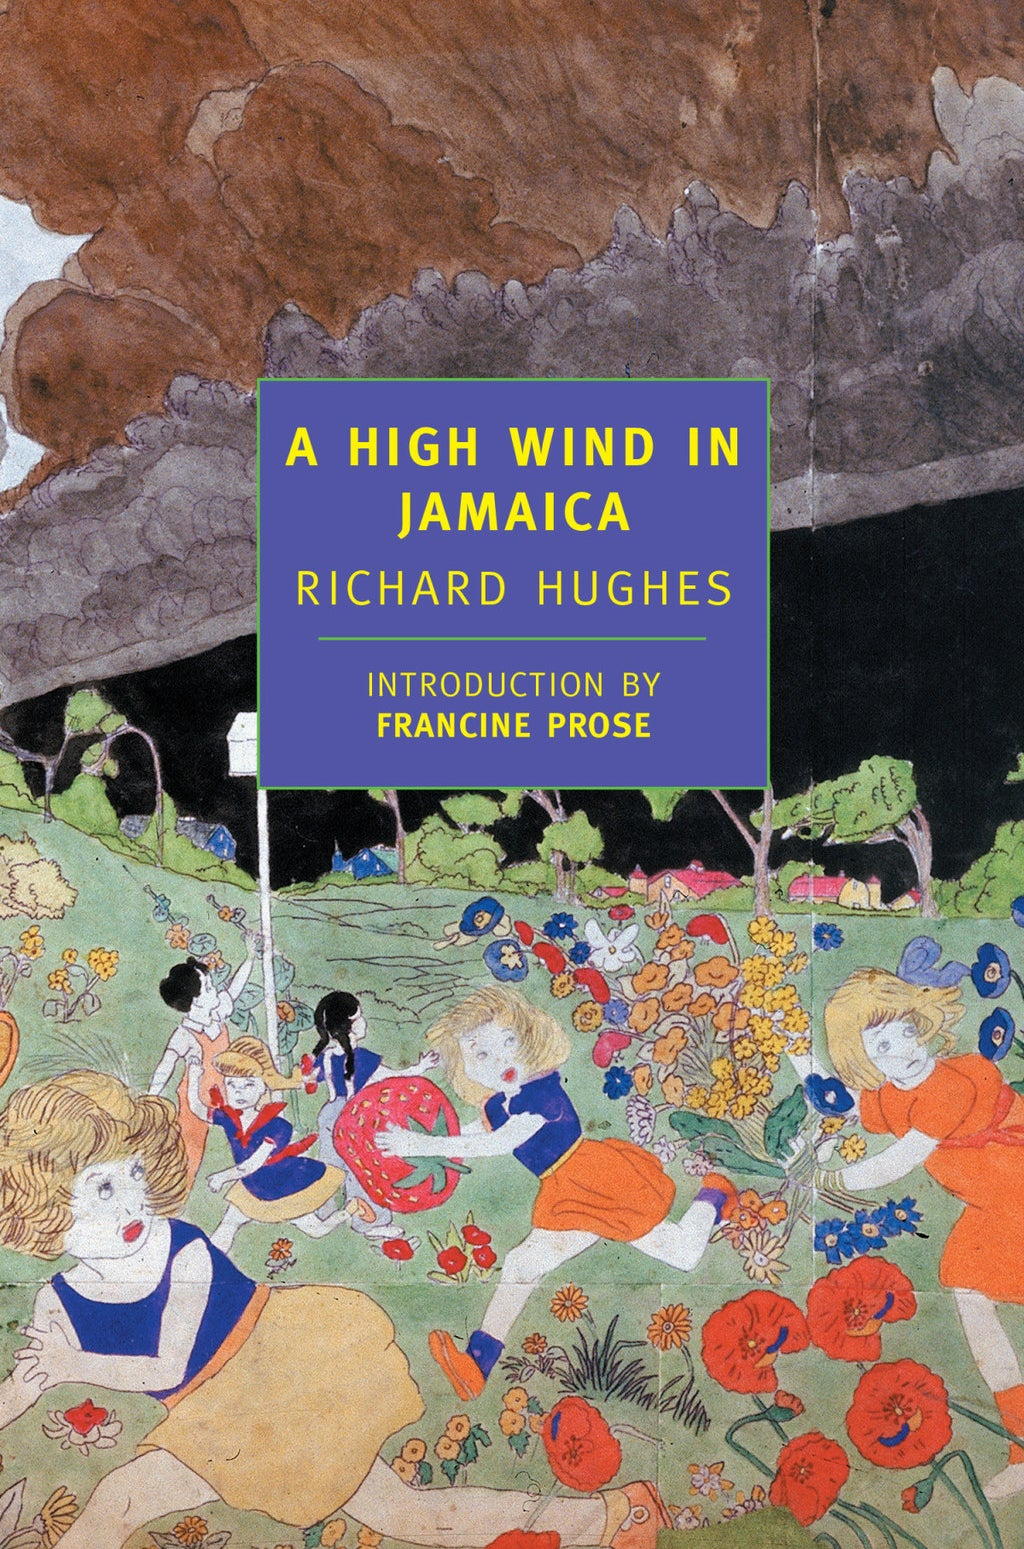 A High Wind in Jamaica by Richard Hughes